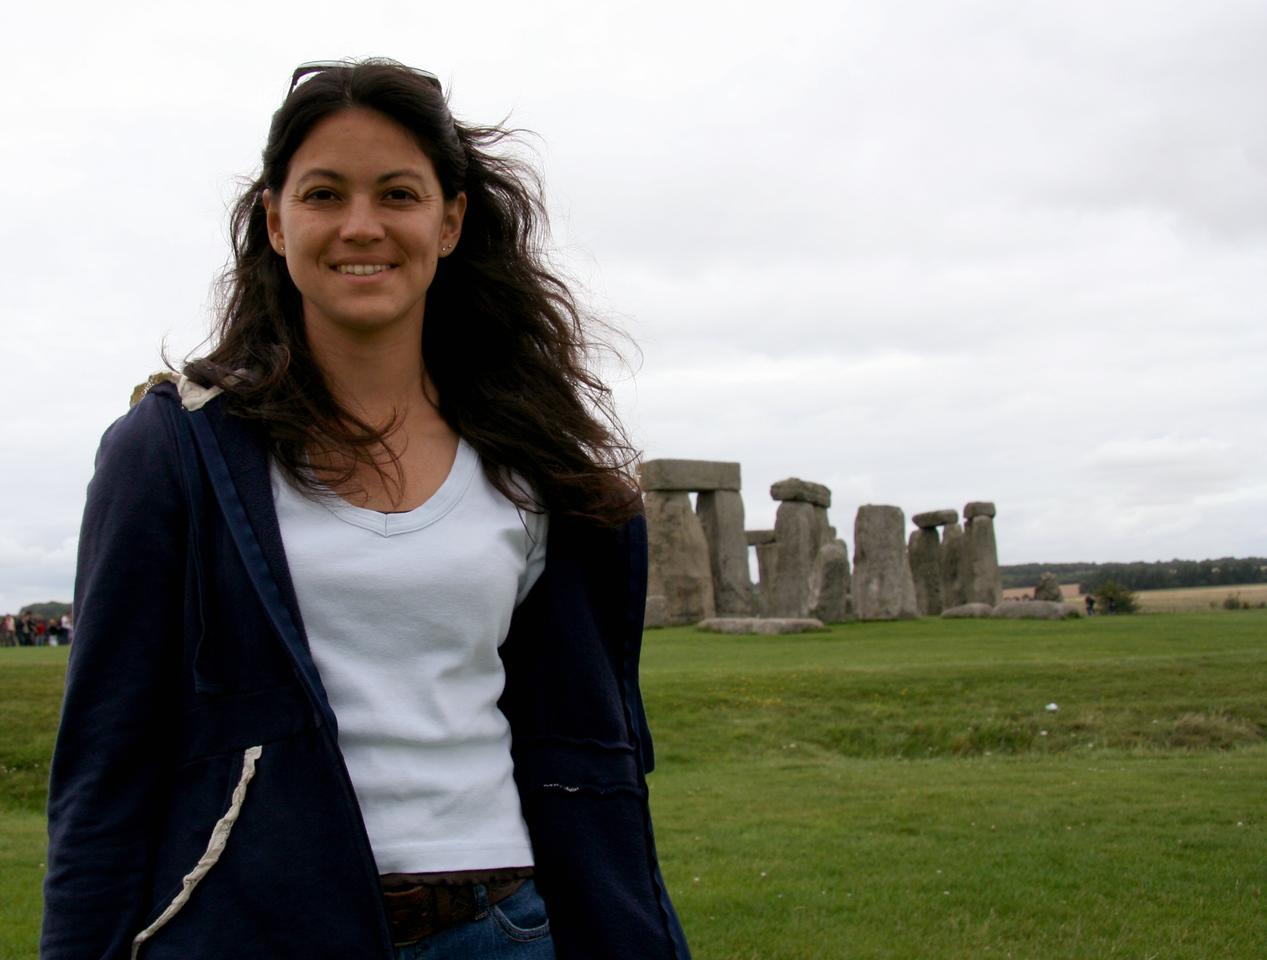 Me at Stonehenge.